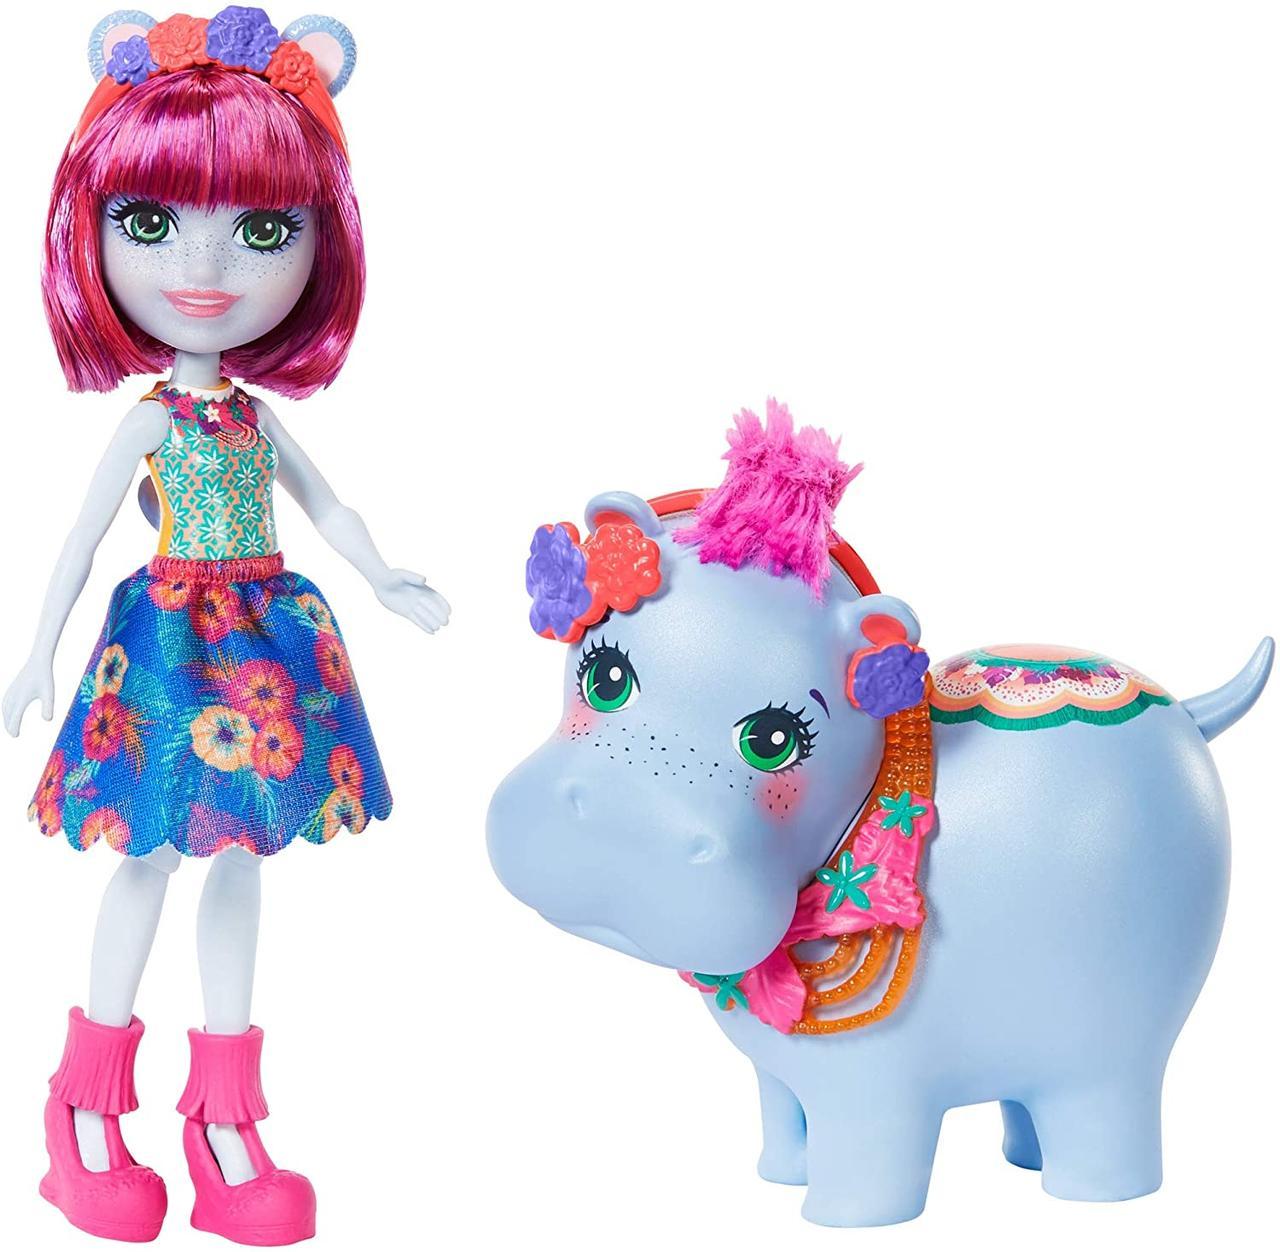 Кукла Энчантималс Хедда Хиппо бегемот Enchantimals Hedda Hippo Lake оригинал хэдда и бегемотик лейк